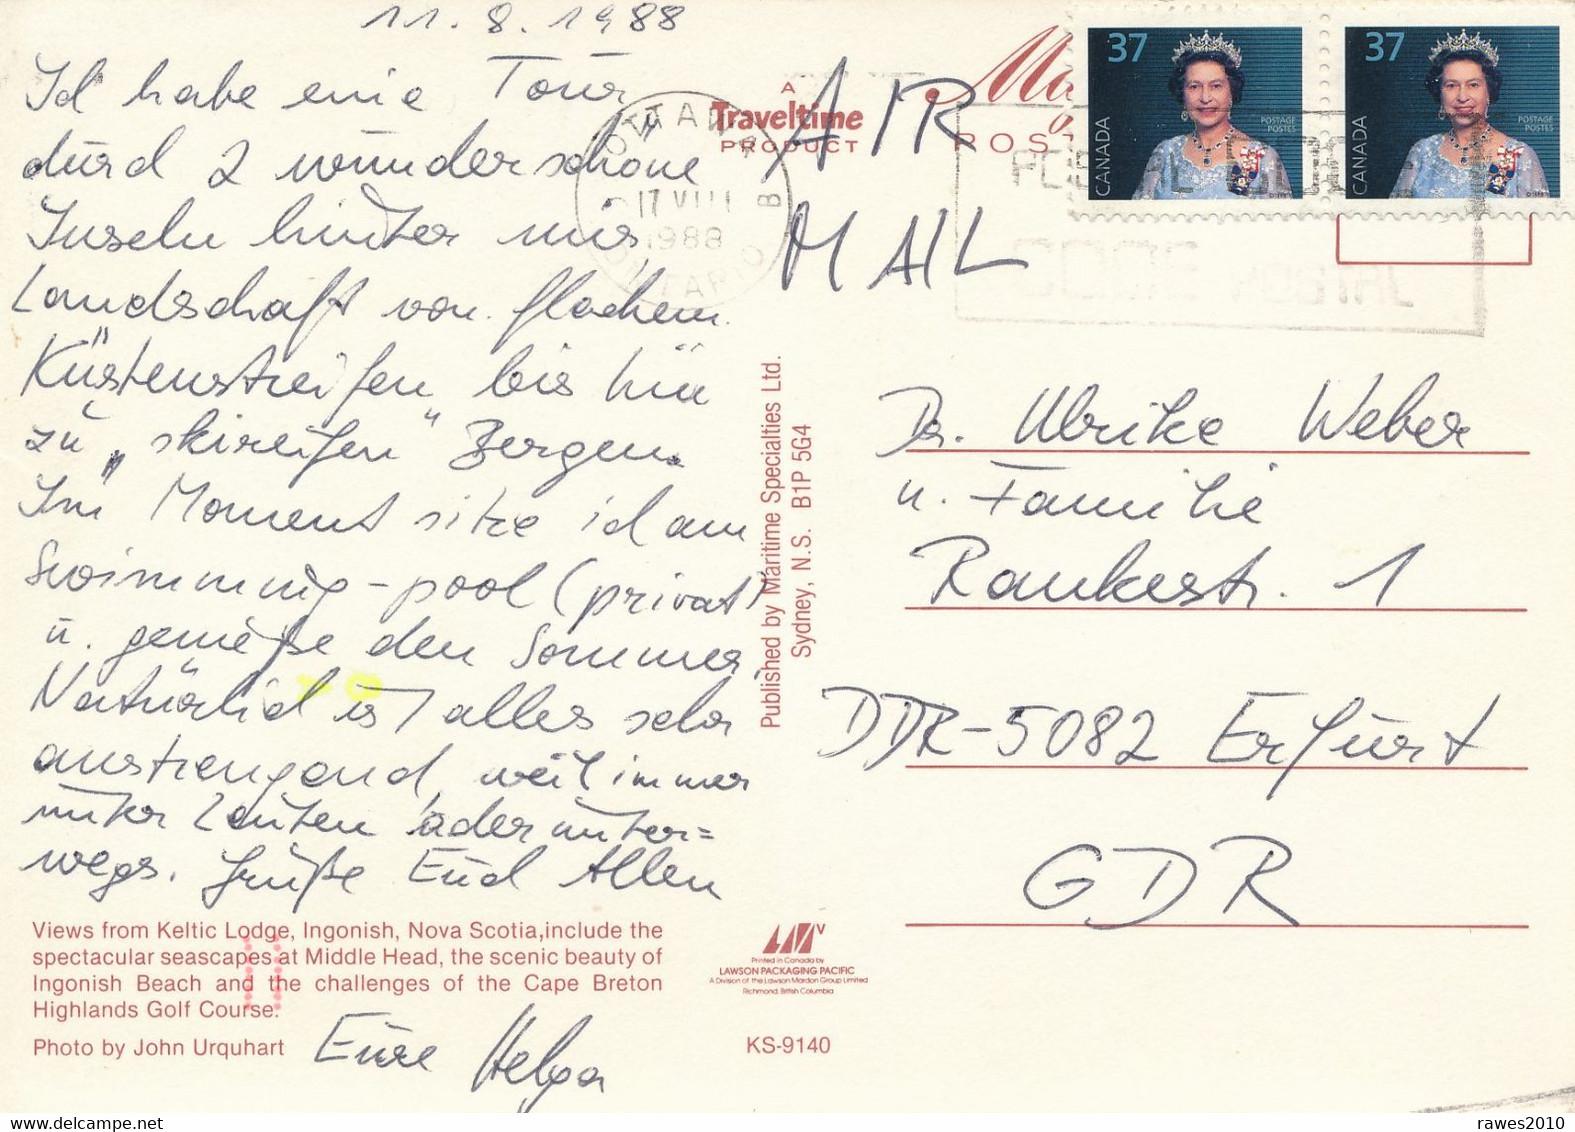 Kanada Ottawa MWST 1988 Mi. 1069 Paar Königin Elisabeth II. Luftpost - Postkarte Nach DDR - Covers & Documents